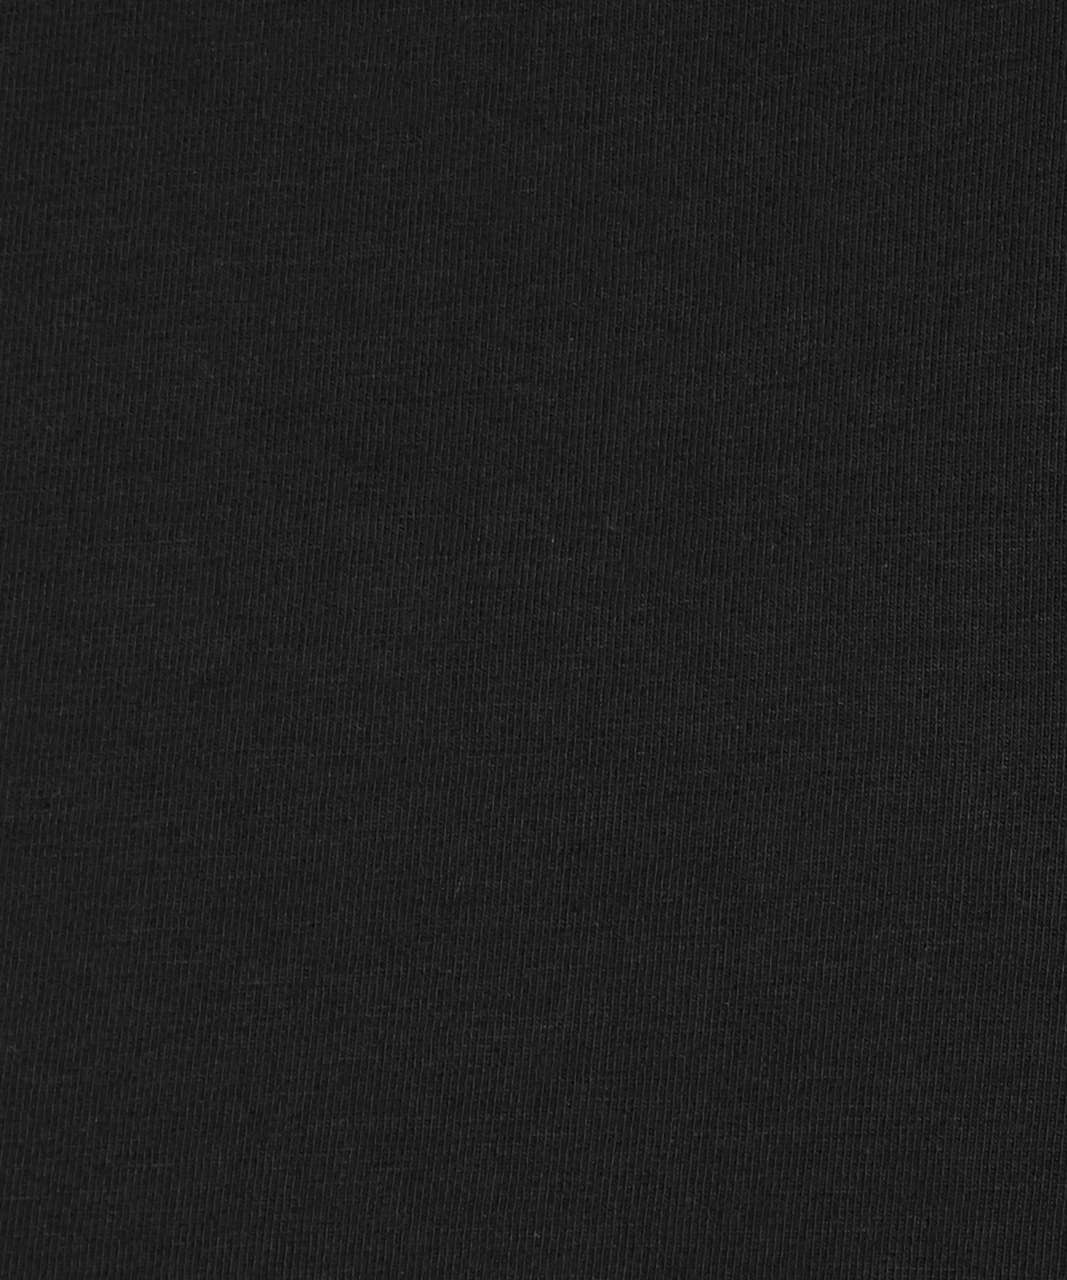 Lululemon Back In Action Long Sleeve - Black